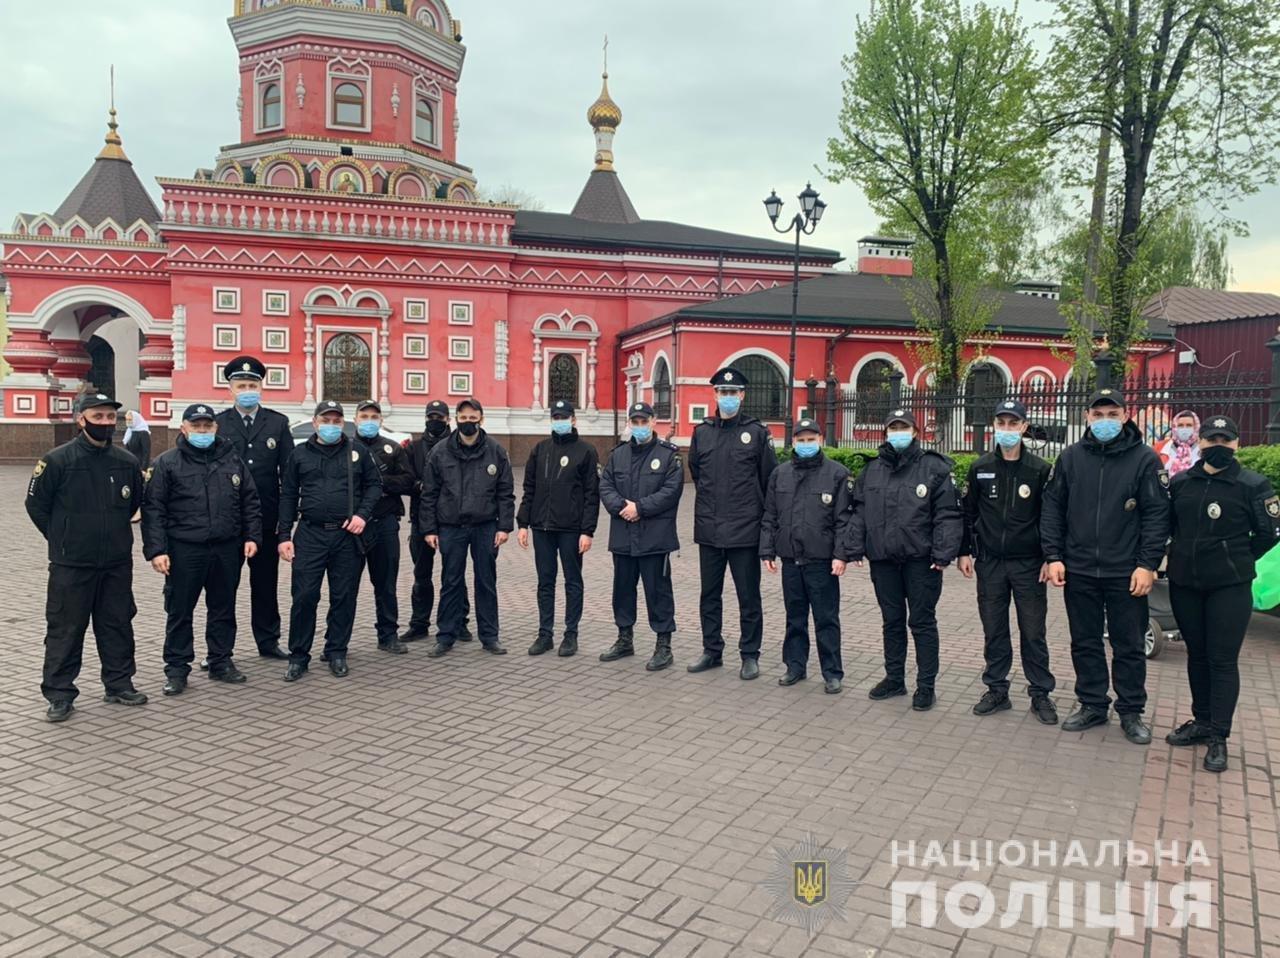 На Пасху на Днепропетровщине полицейские зафиксировали 3 нарушения карантинных норм в храмах, - ФОТО  , фото-2